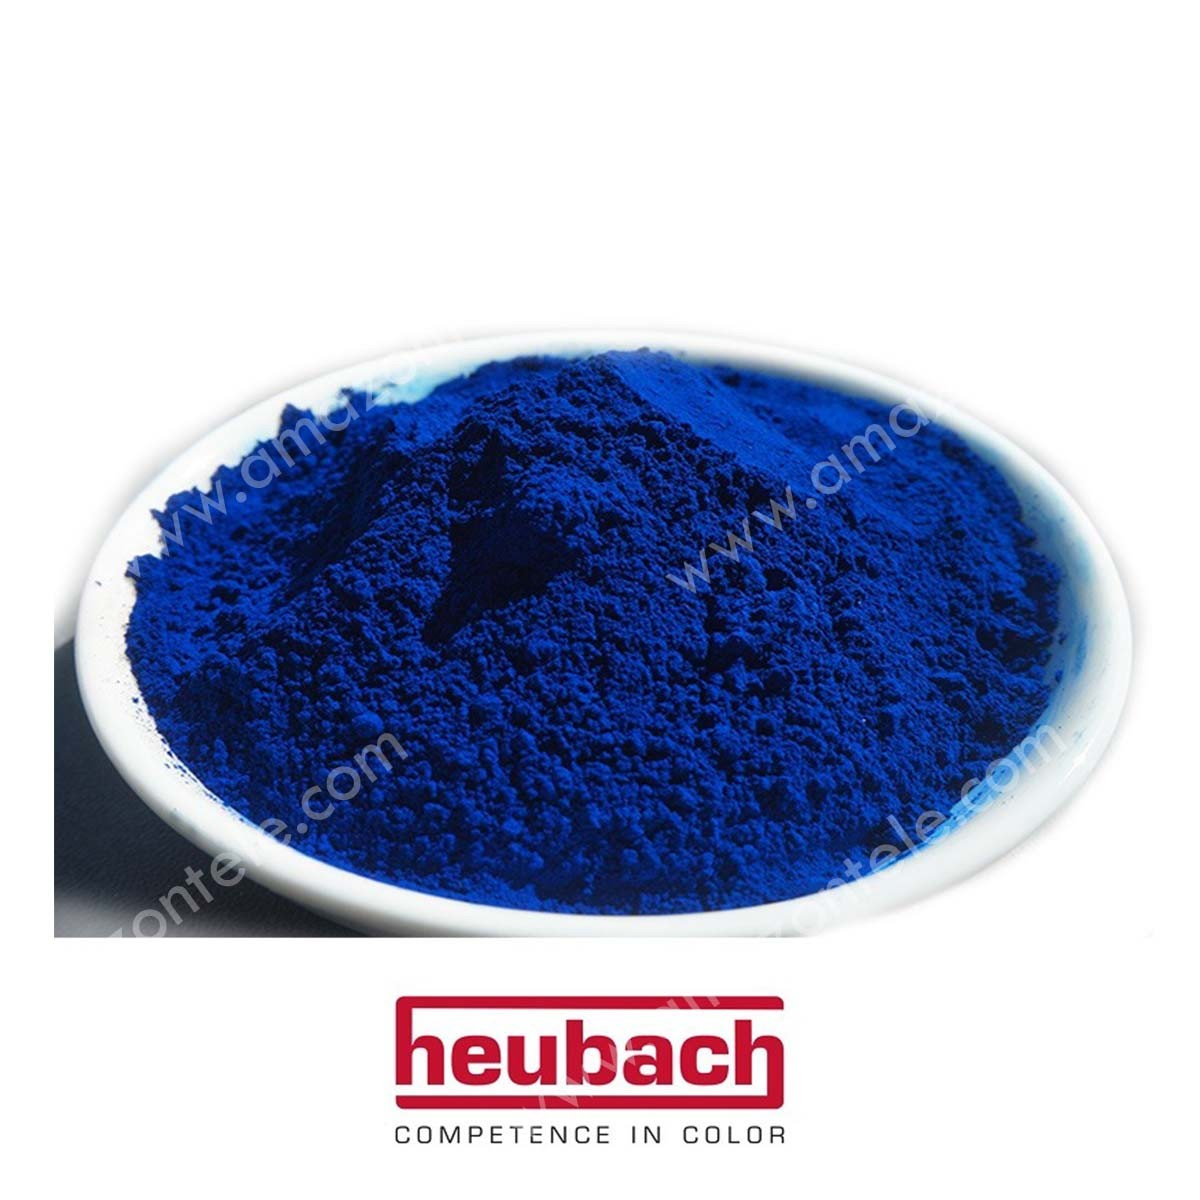 پیگمنت آبی 15:3- Pigment Blue 15:3